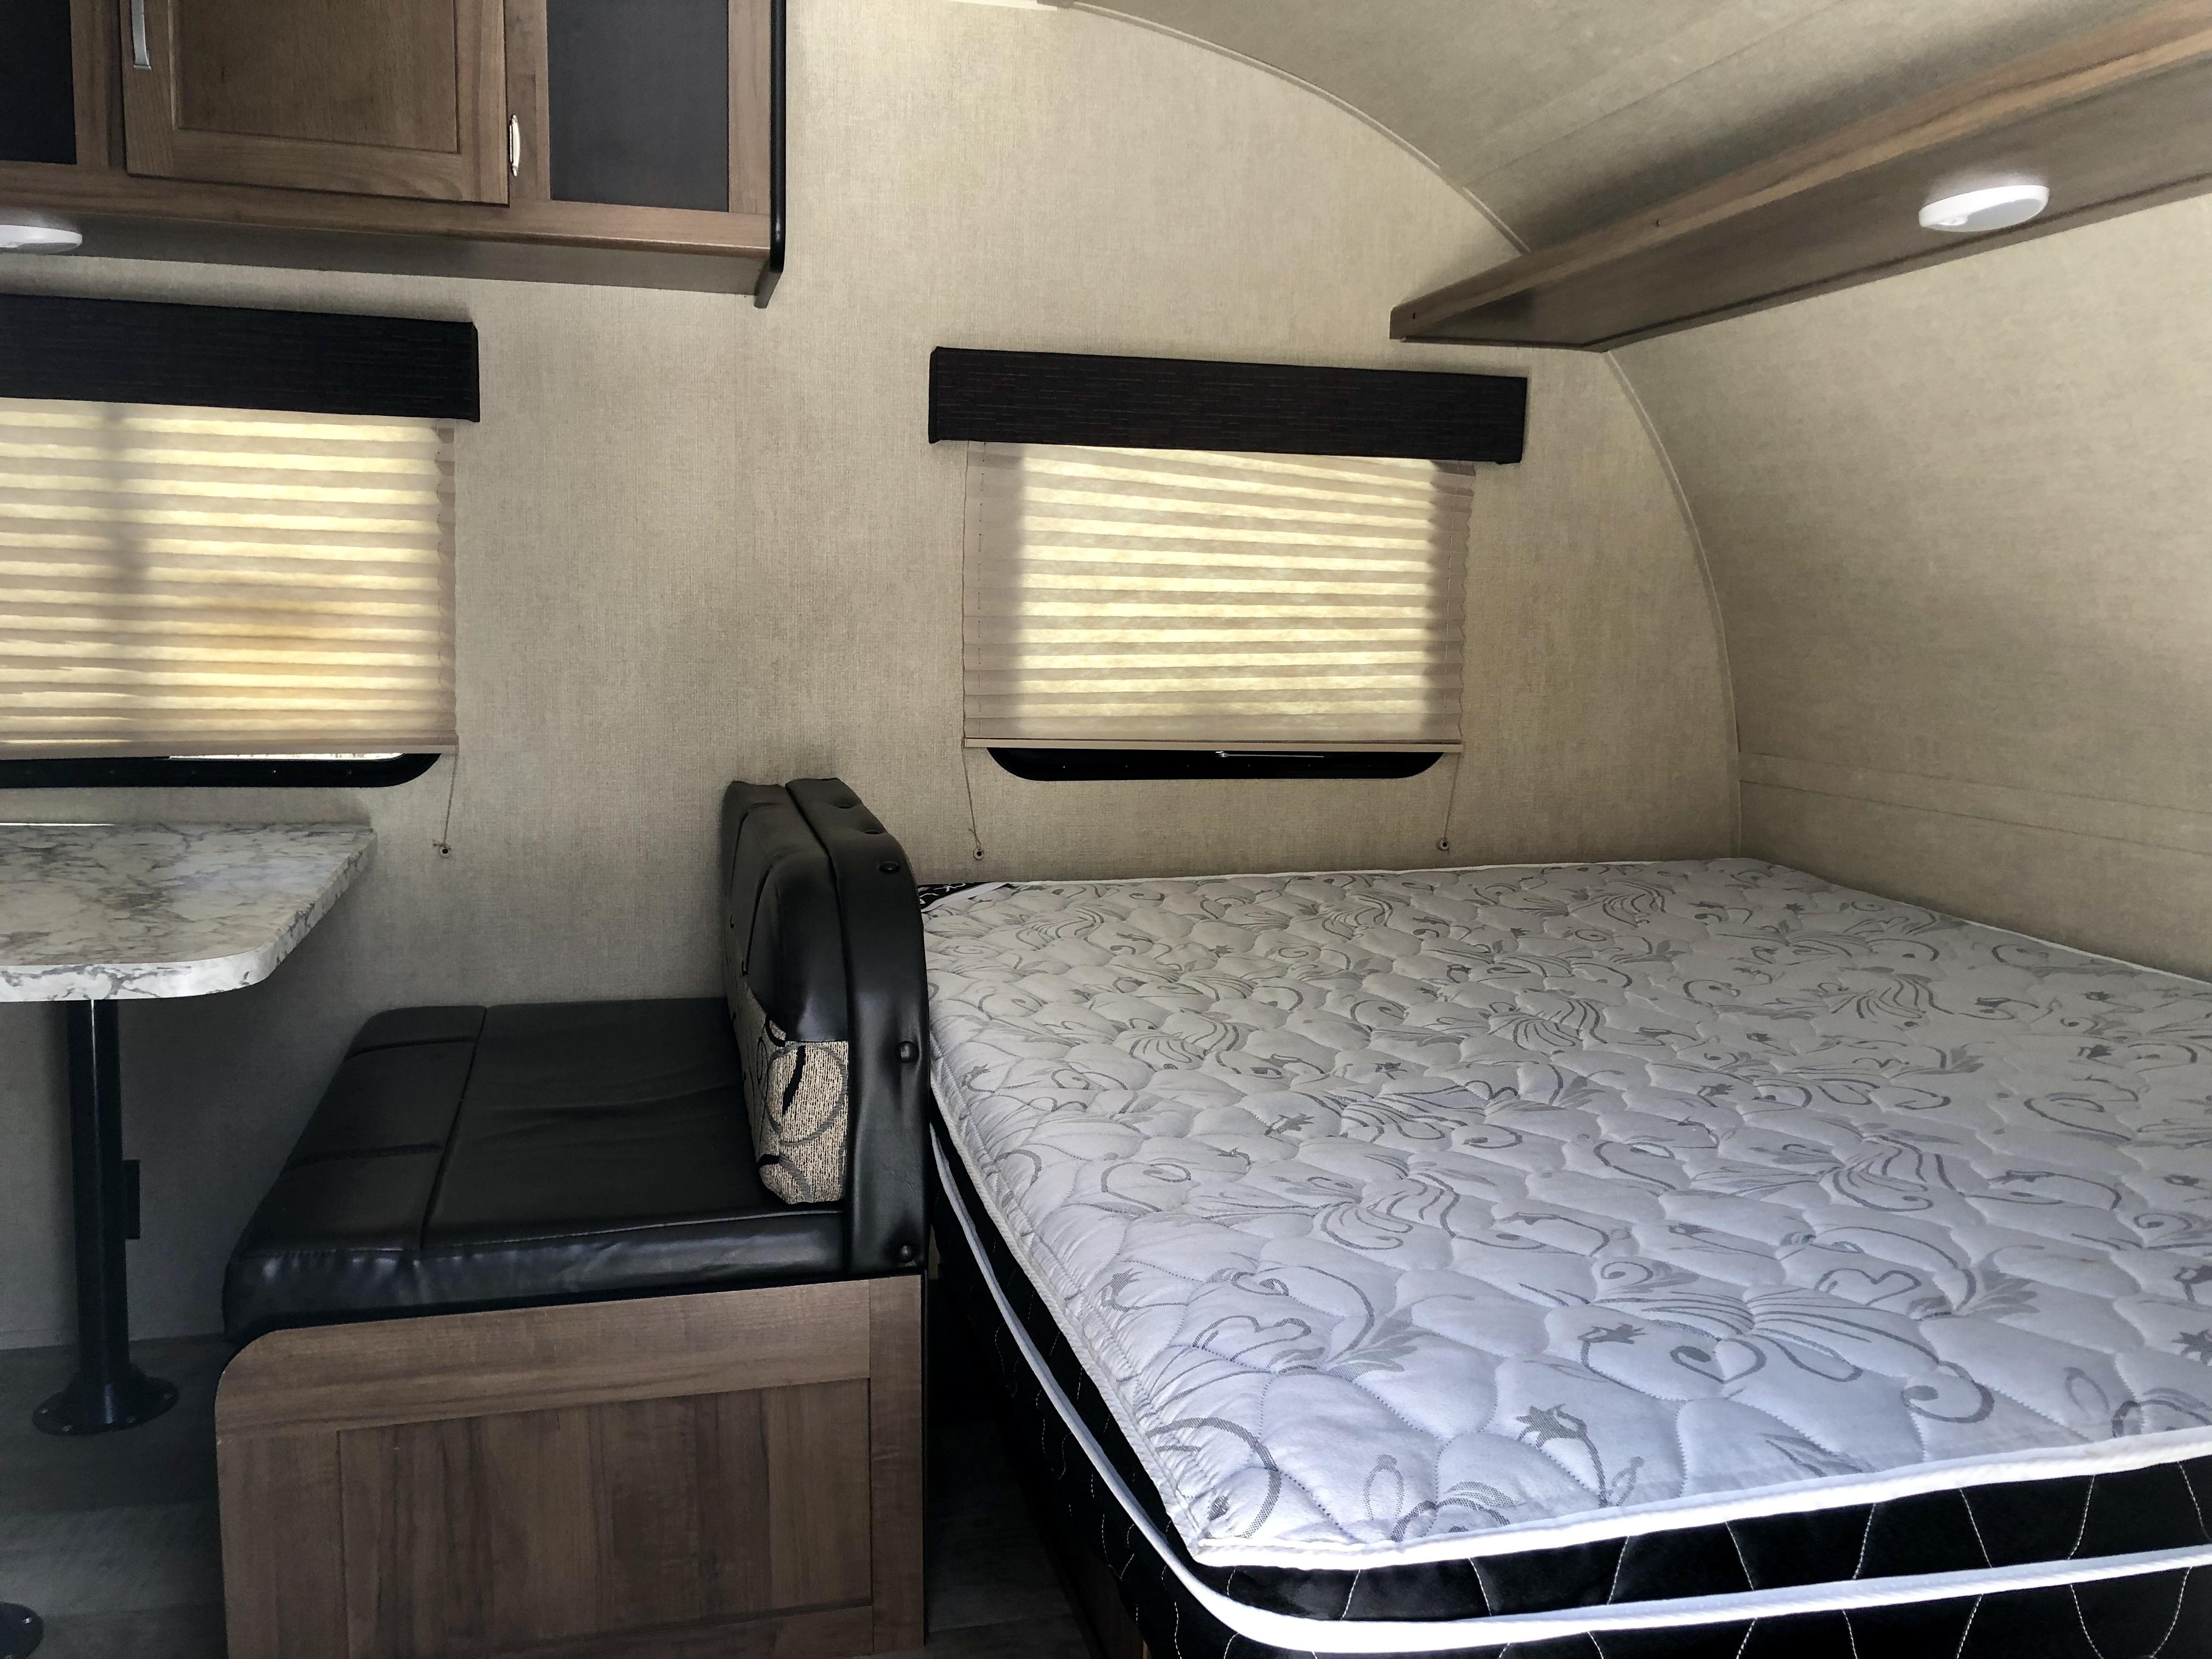 View of front of trailer when walking in. Gulf Stream Amerilite 2019